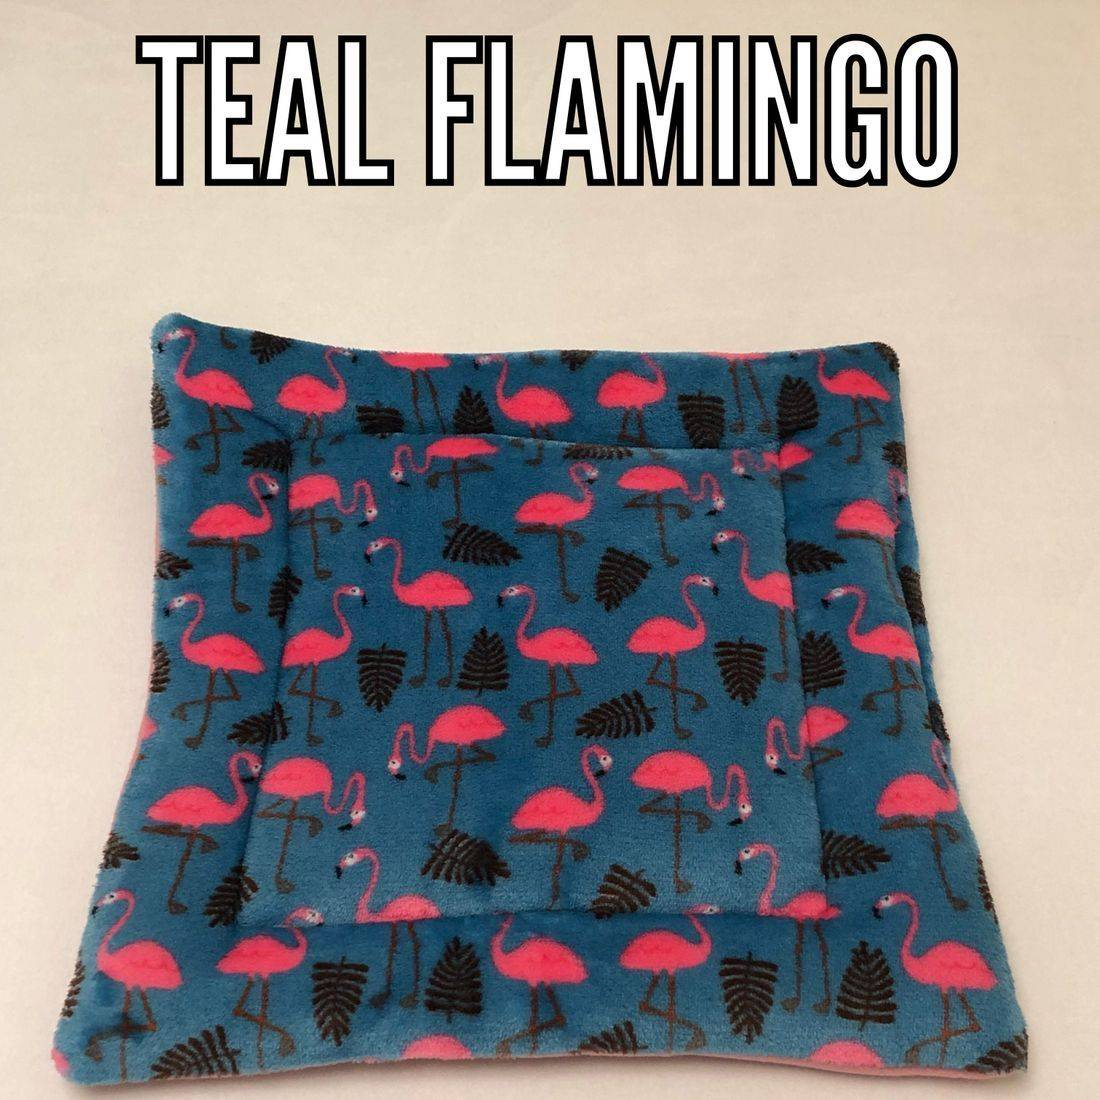 Teal Flamingo fabric